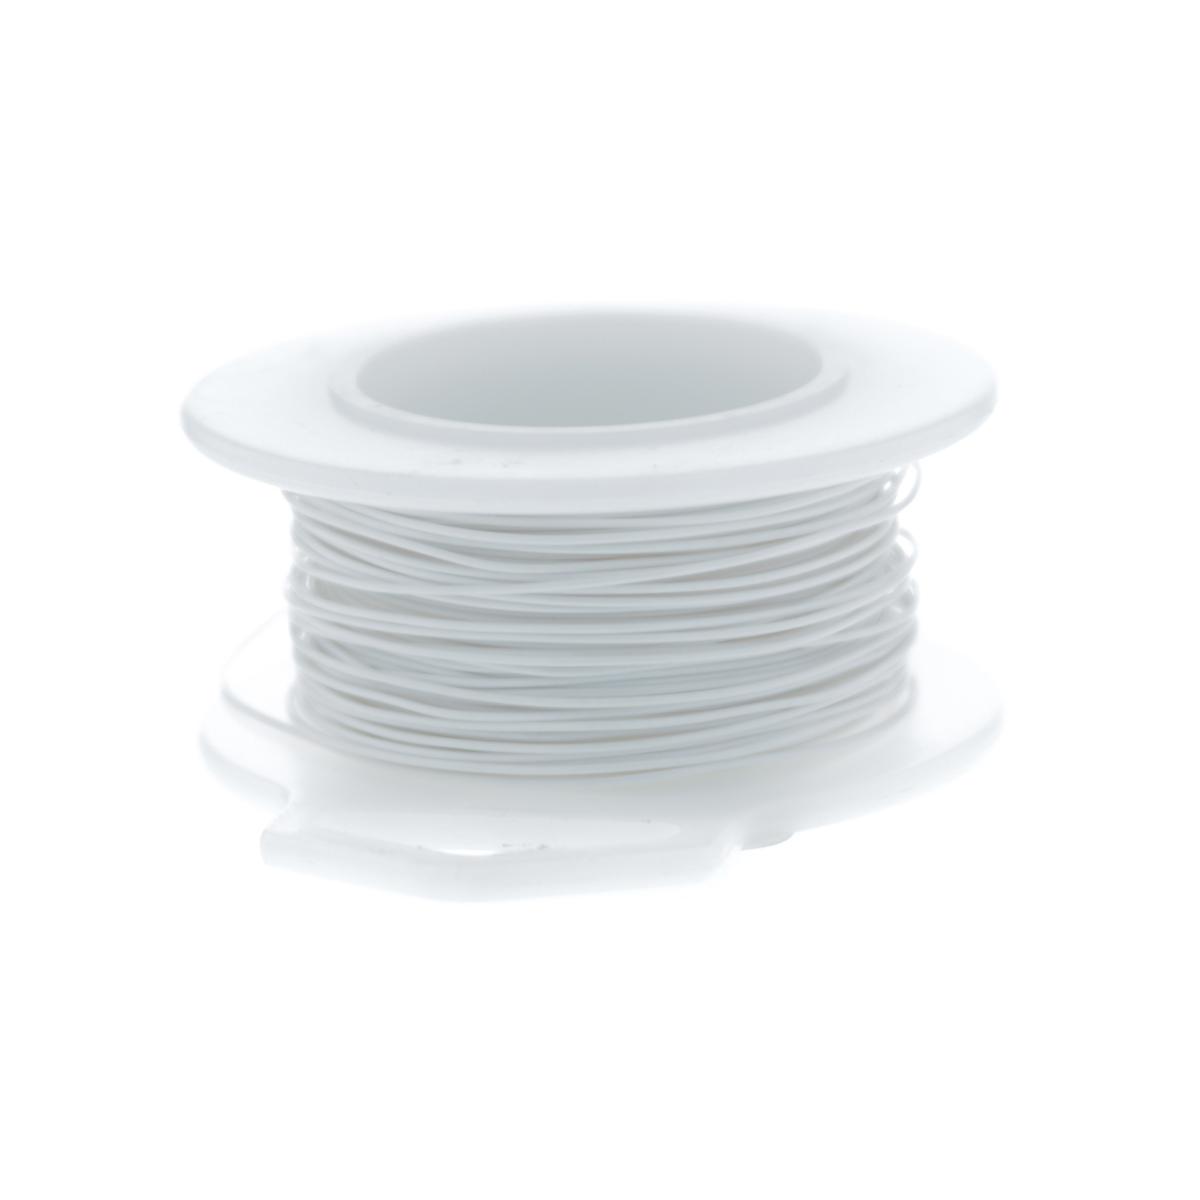 Ultra White Silver Plated Copper Craft Wire